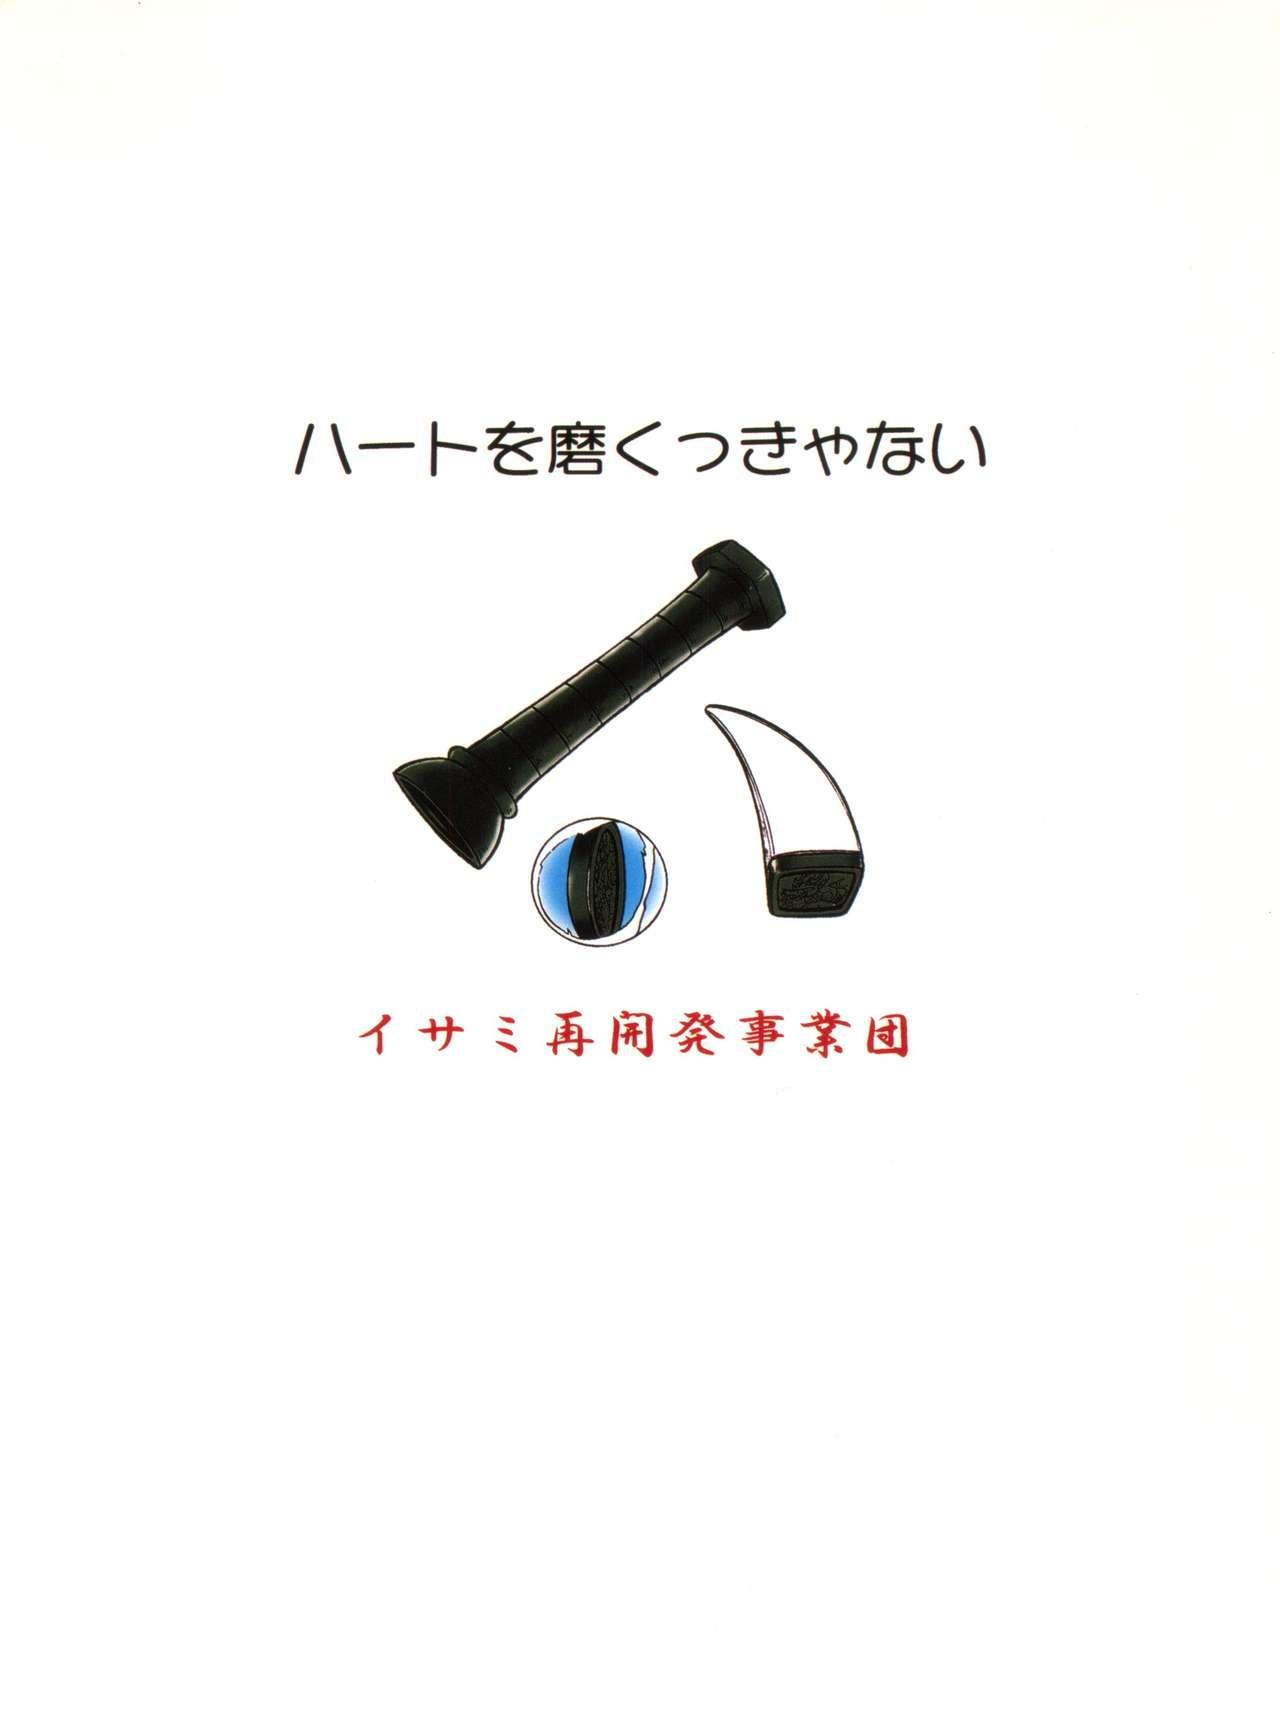 Heart o Migakukkya Nai 111